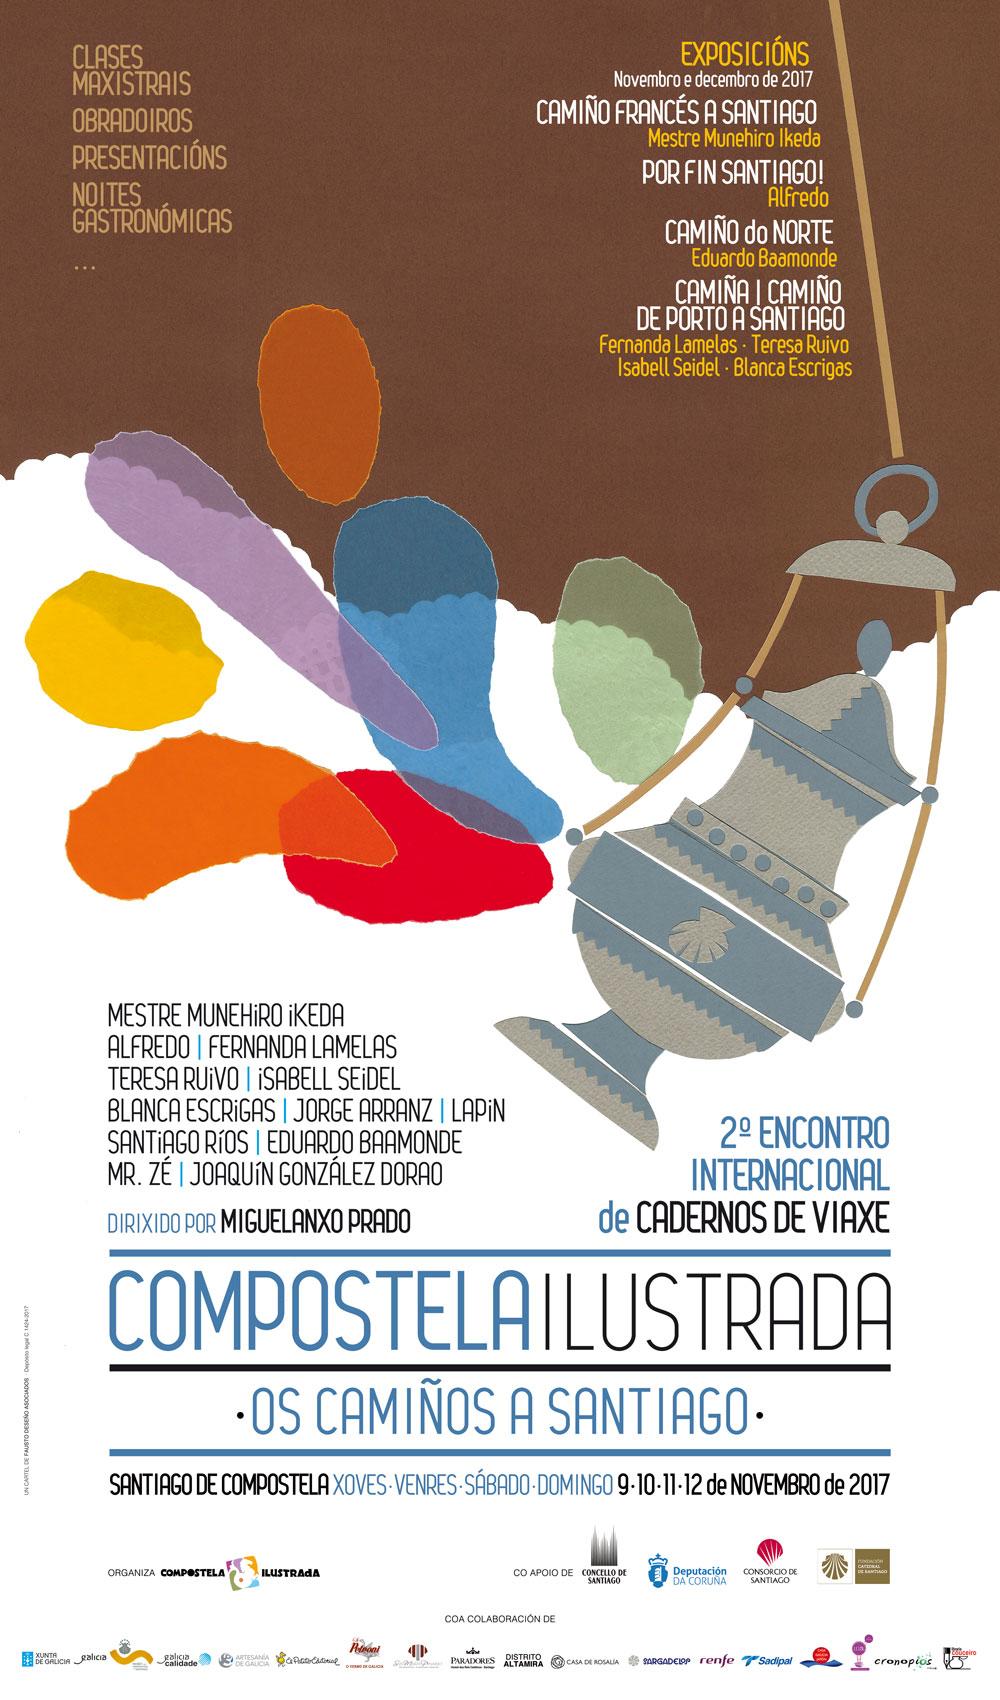 <i>Compostela Ilustrada</i> contará con artistas como Munehiro Ikeda, Alfredo, Jorge Arranz, Fernanda Lamelas ou Isabell Seidell